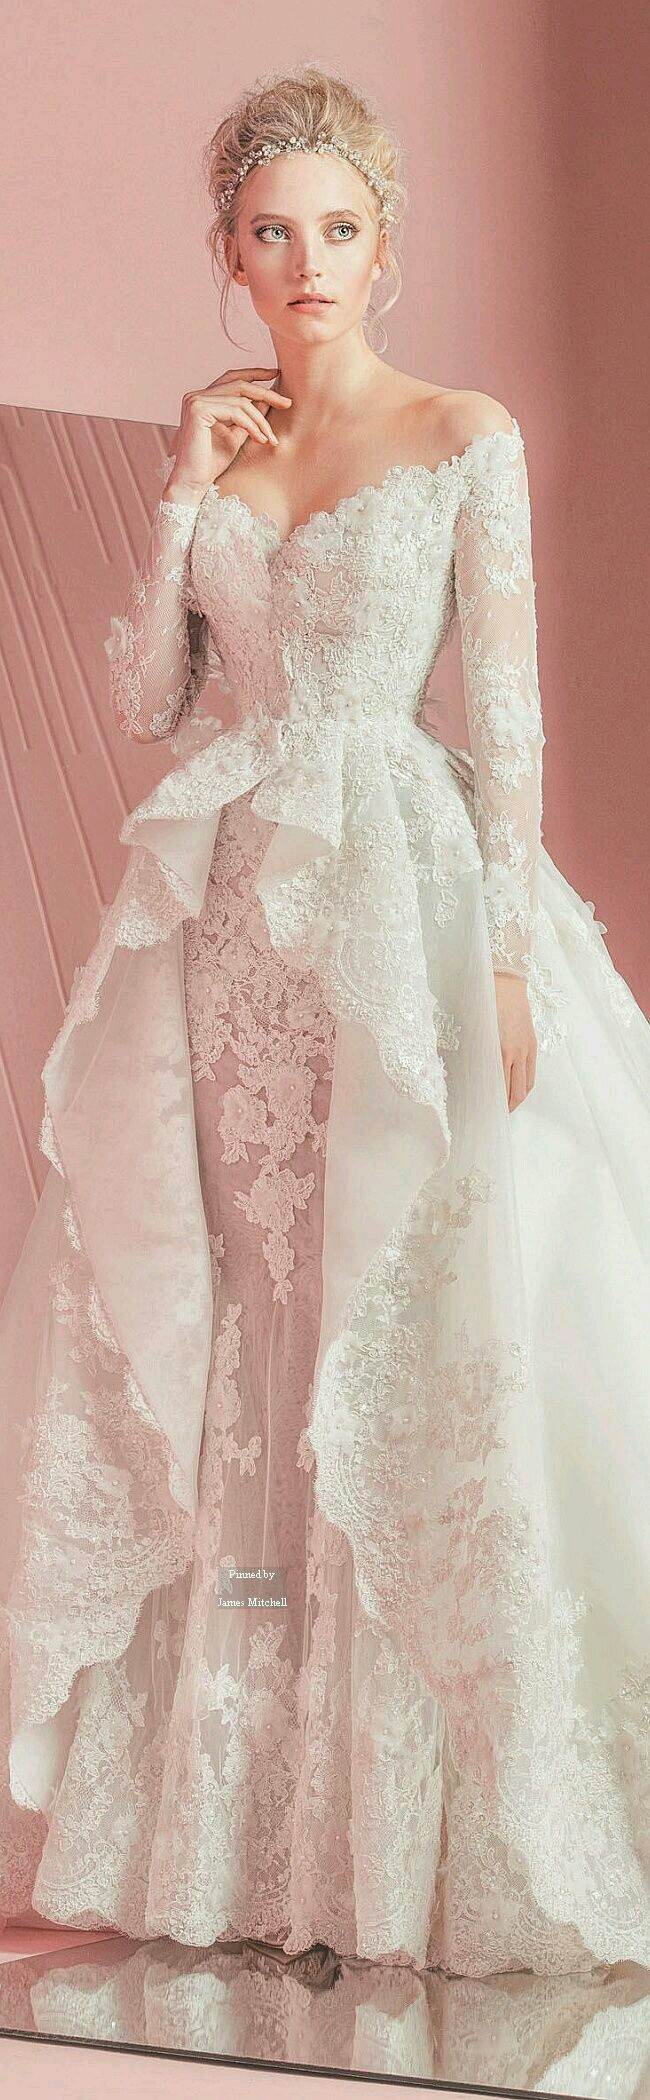 Pin de seika en ドレスアップ Dress-up | Pinterest | Vestidos de ...